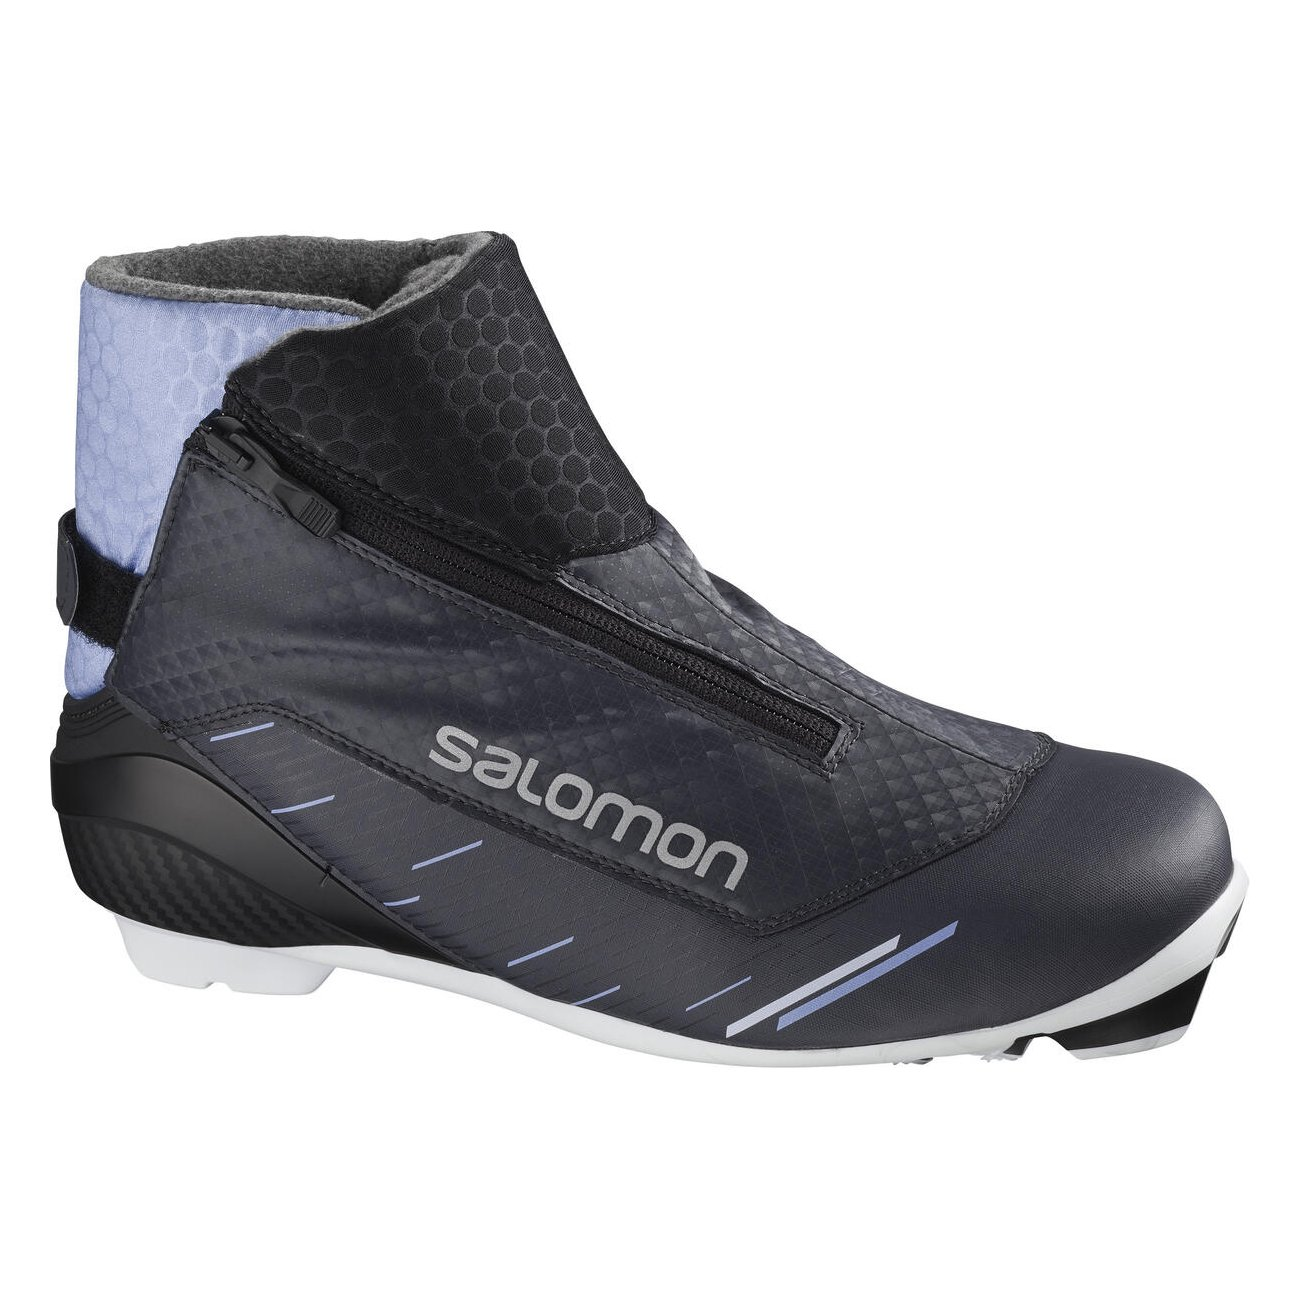 Salomon RC9 Vitane Nocturne Prolink 2020/21